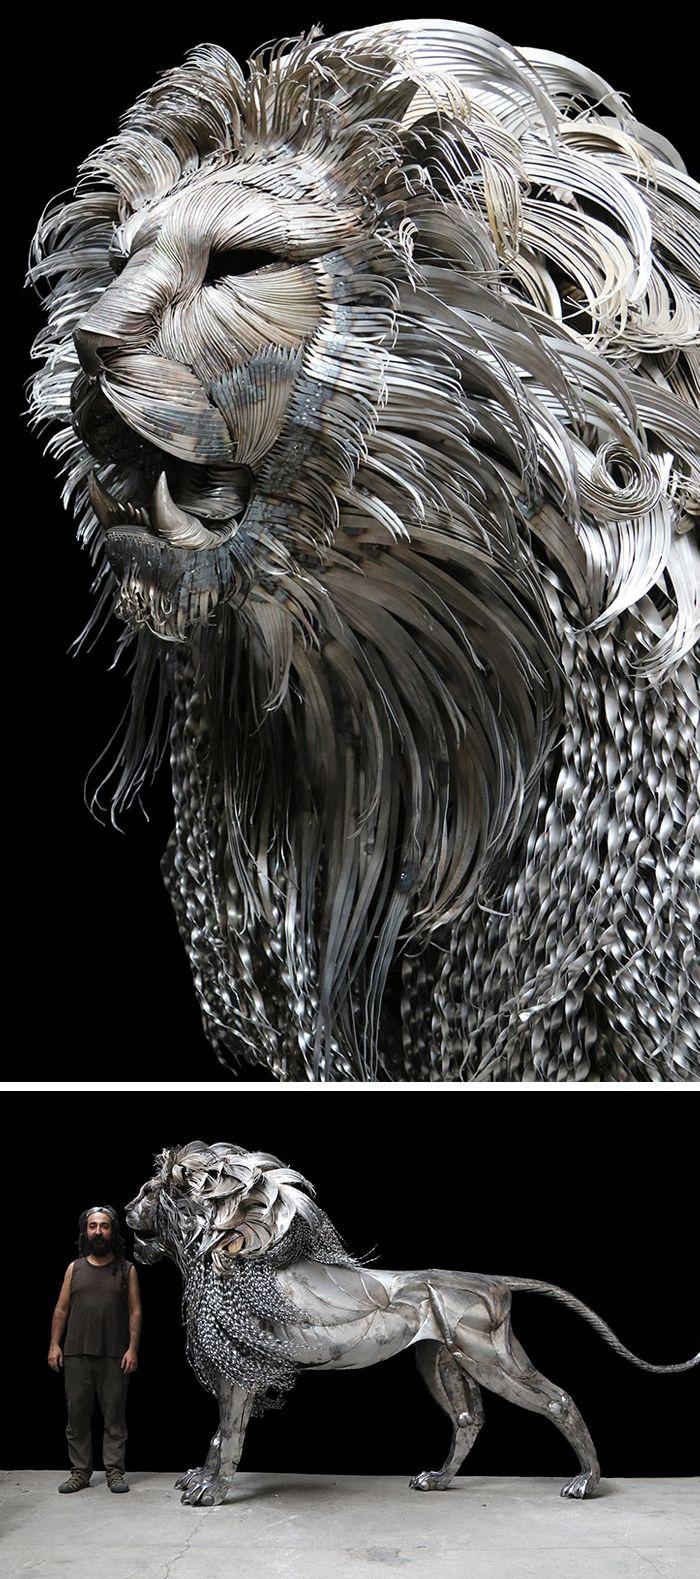 Larger-than-life steel #sculpture by Selçuk Yılmaz #animalart #animalsculpture